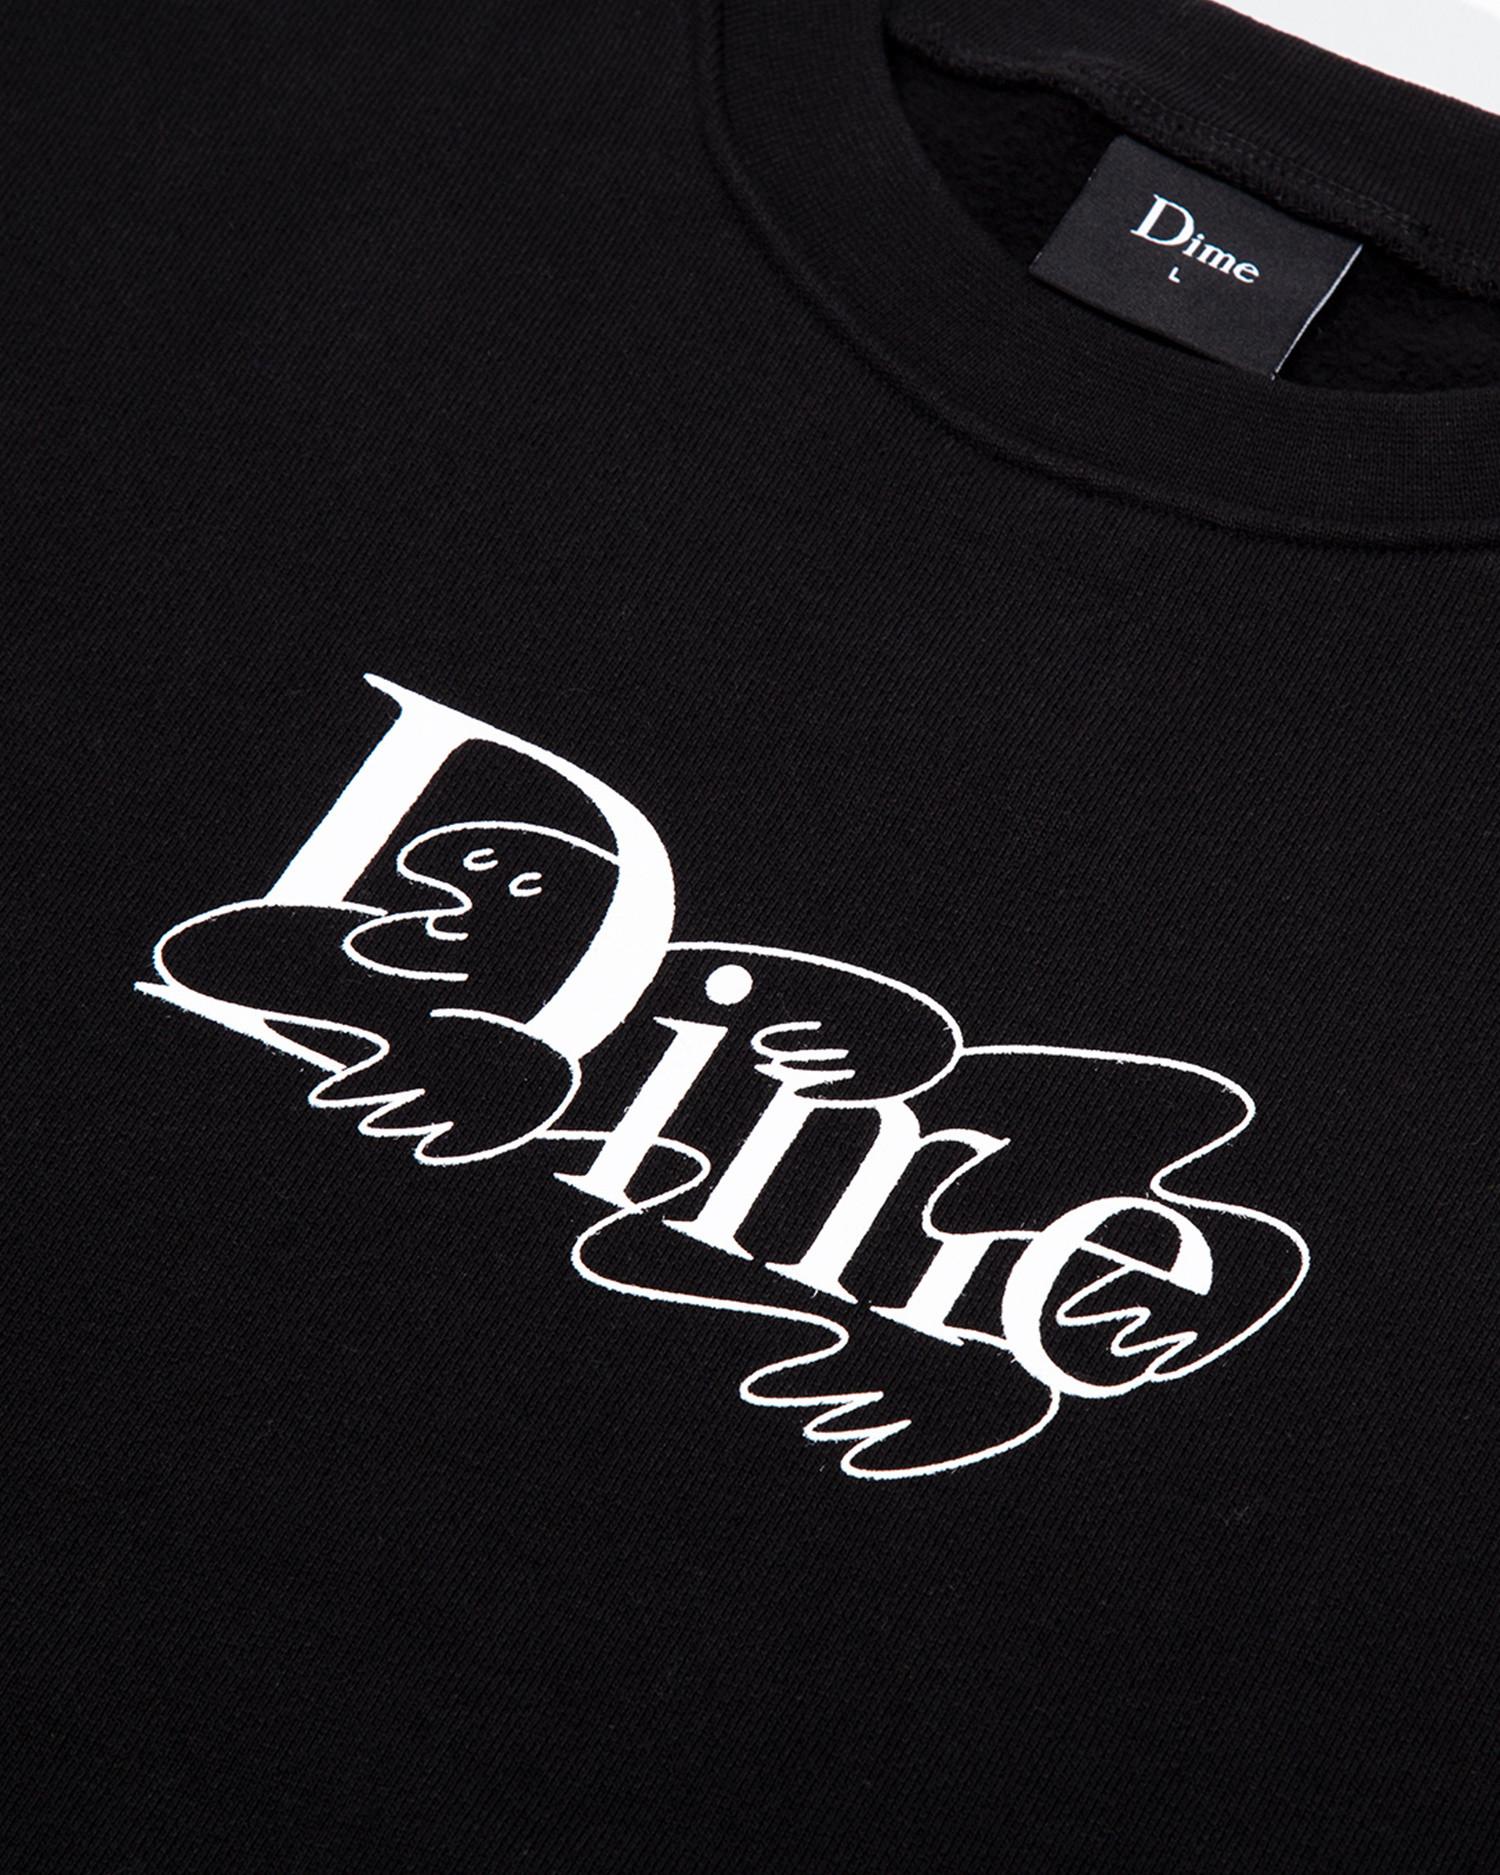 Dime Chilling Classic Logo Crewneck Black